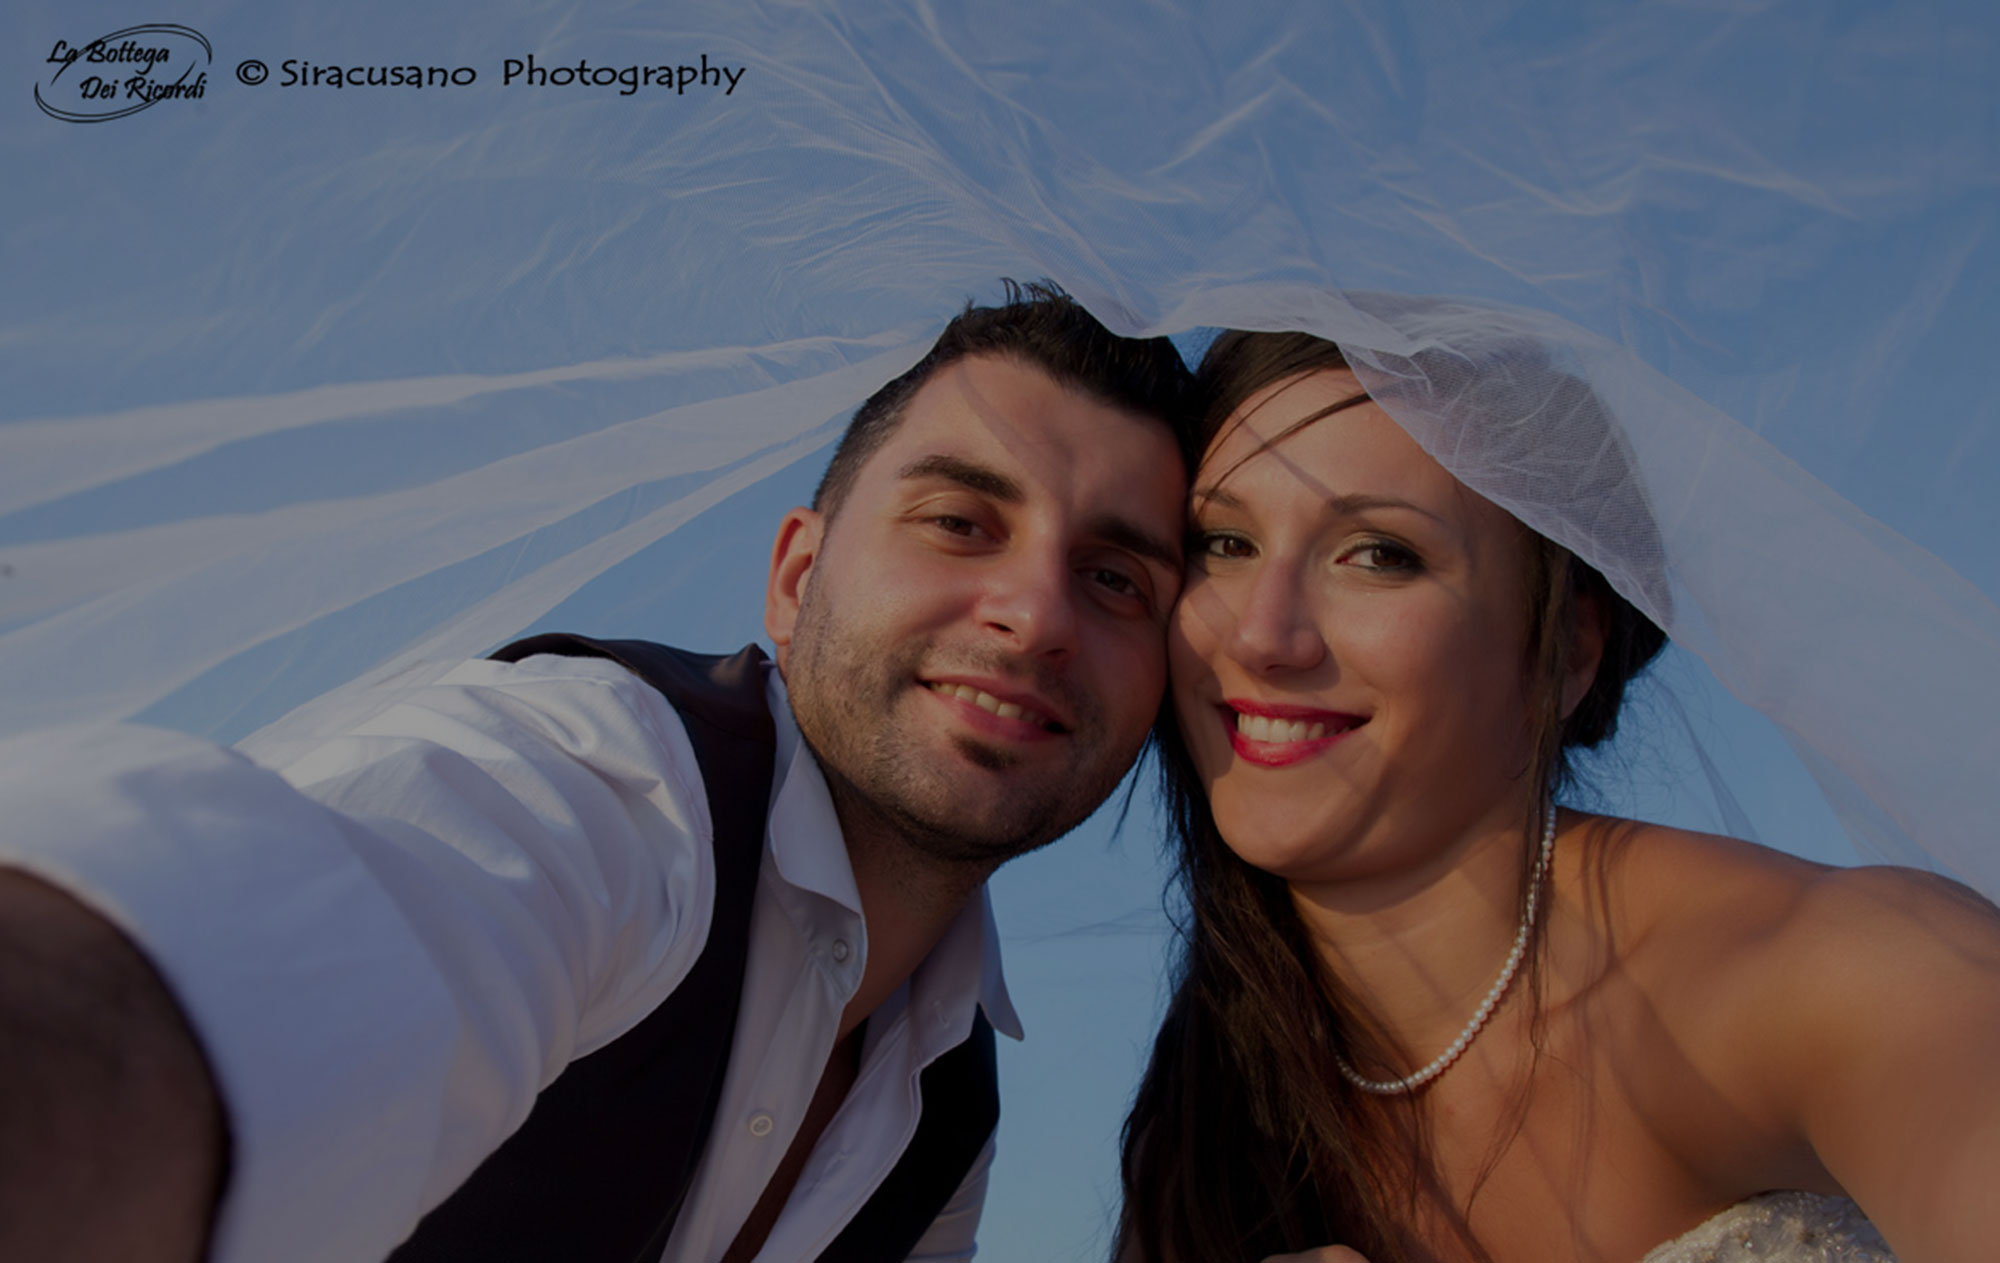 Fotografo Matrimonio La Bottega dei Ricordi Messina - Matrimonio Maurizio e Katia